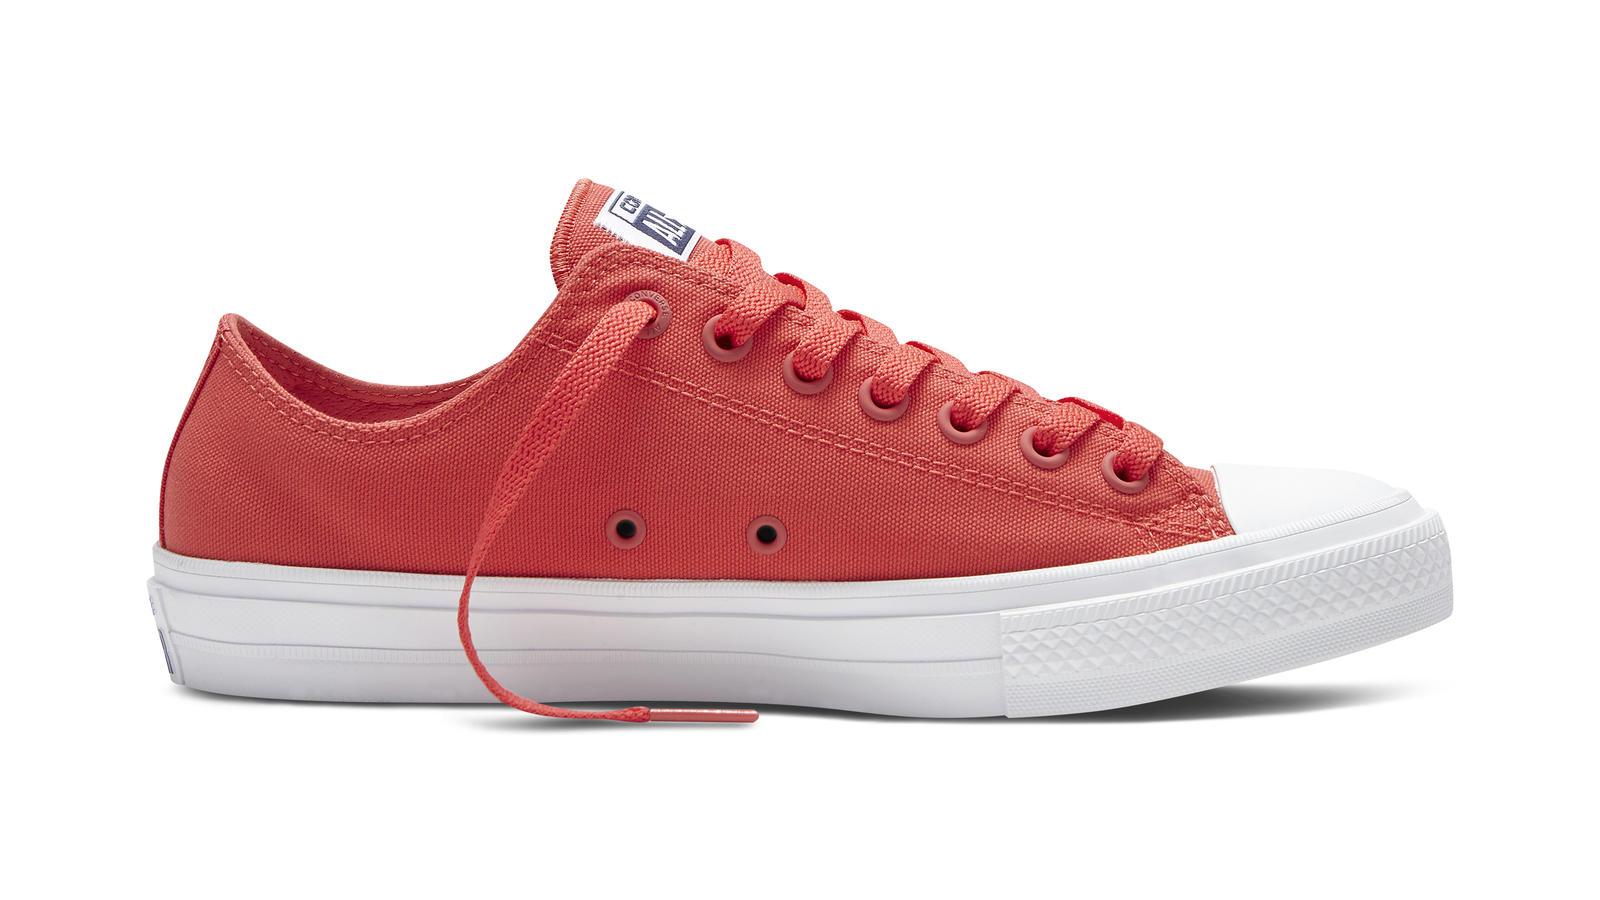 d874eb1e2ecd Converse Chuck Taylor All Star Ii Neon Coral Low Top Original